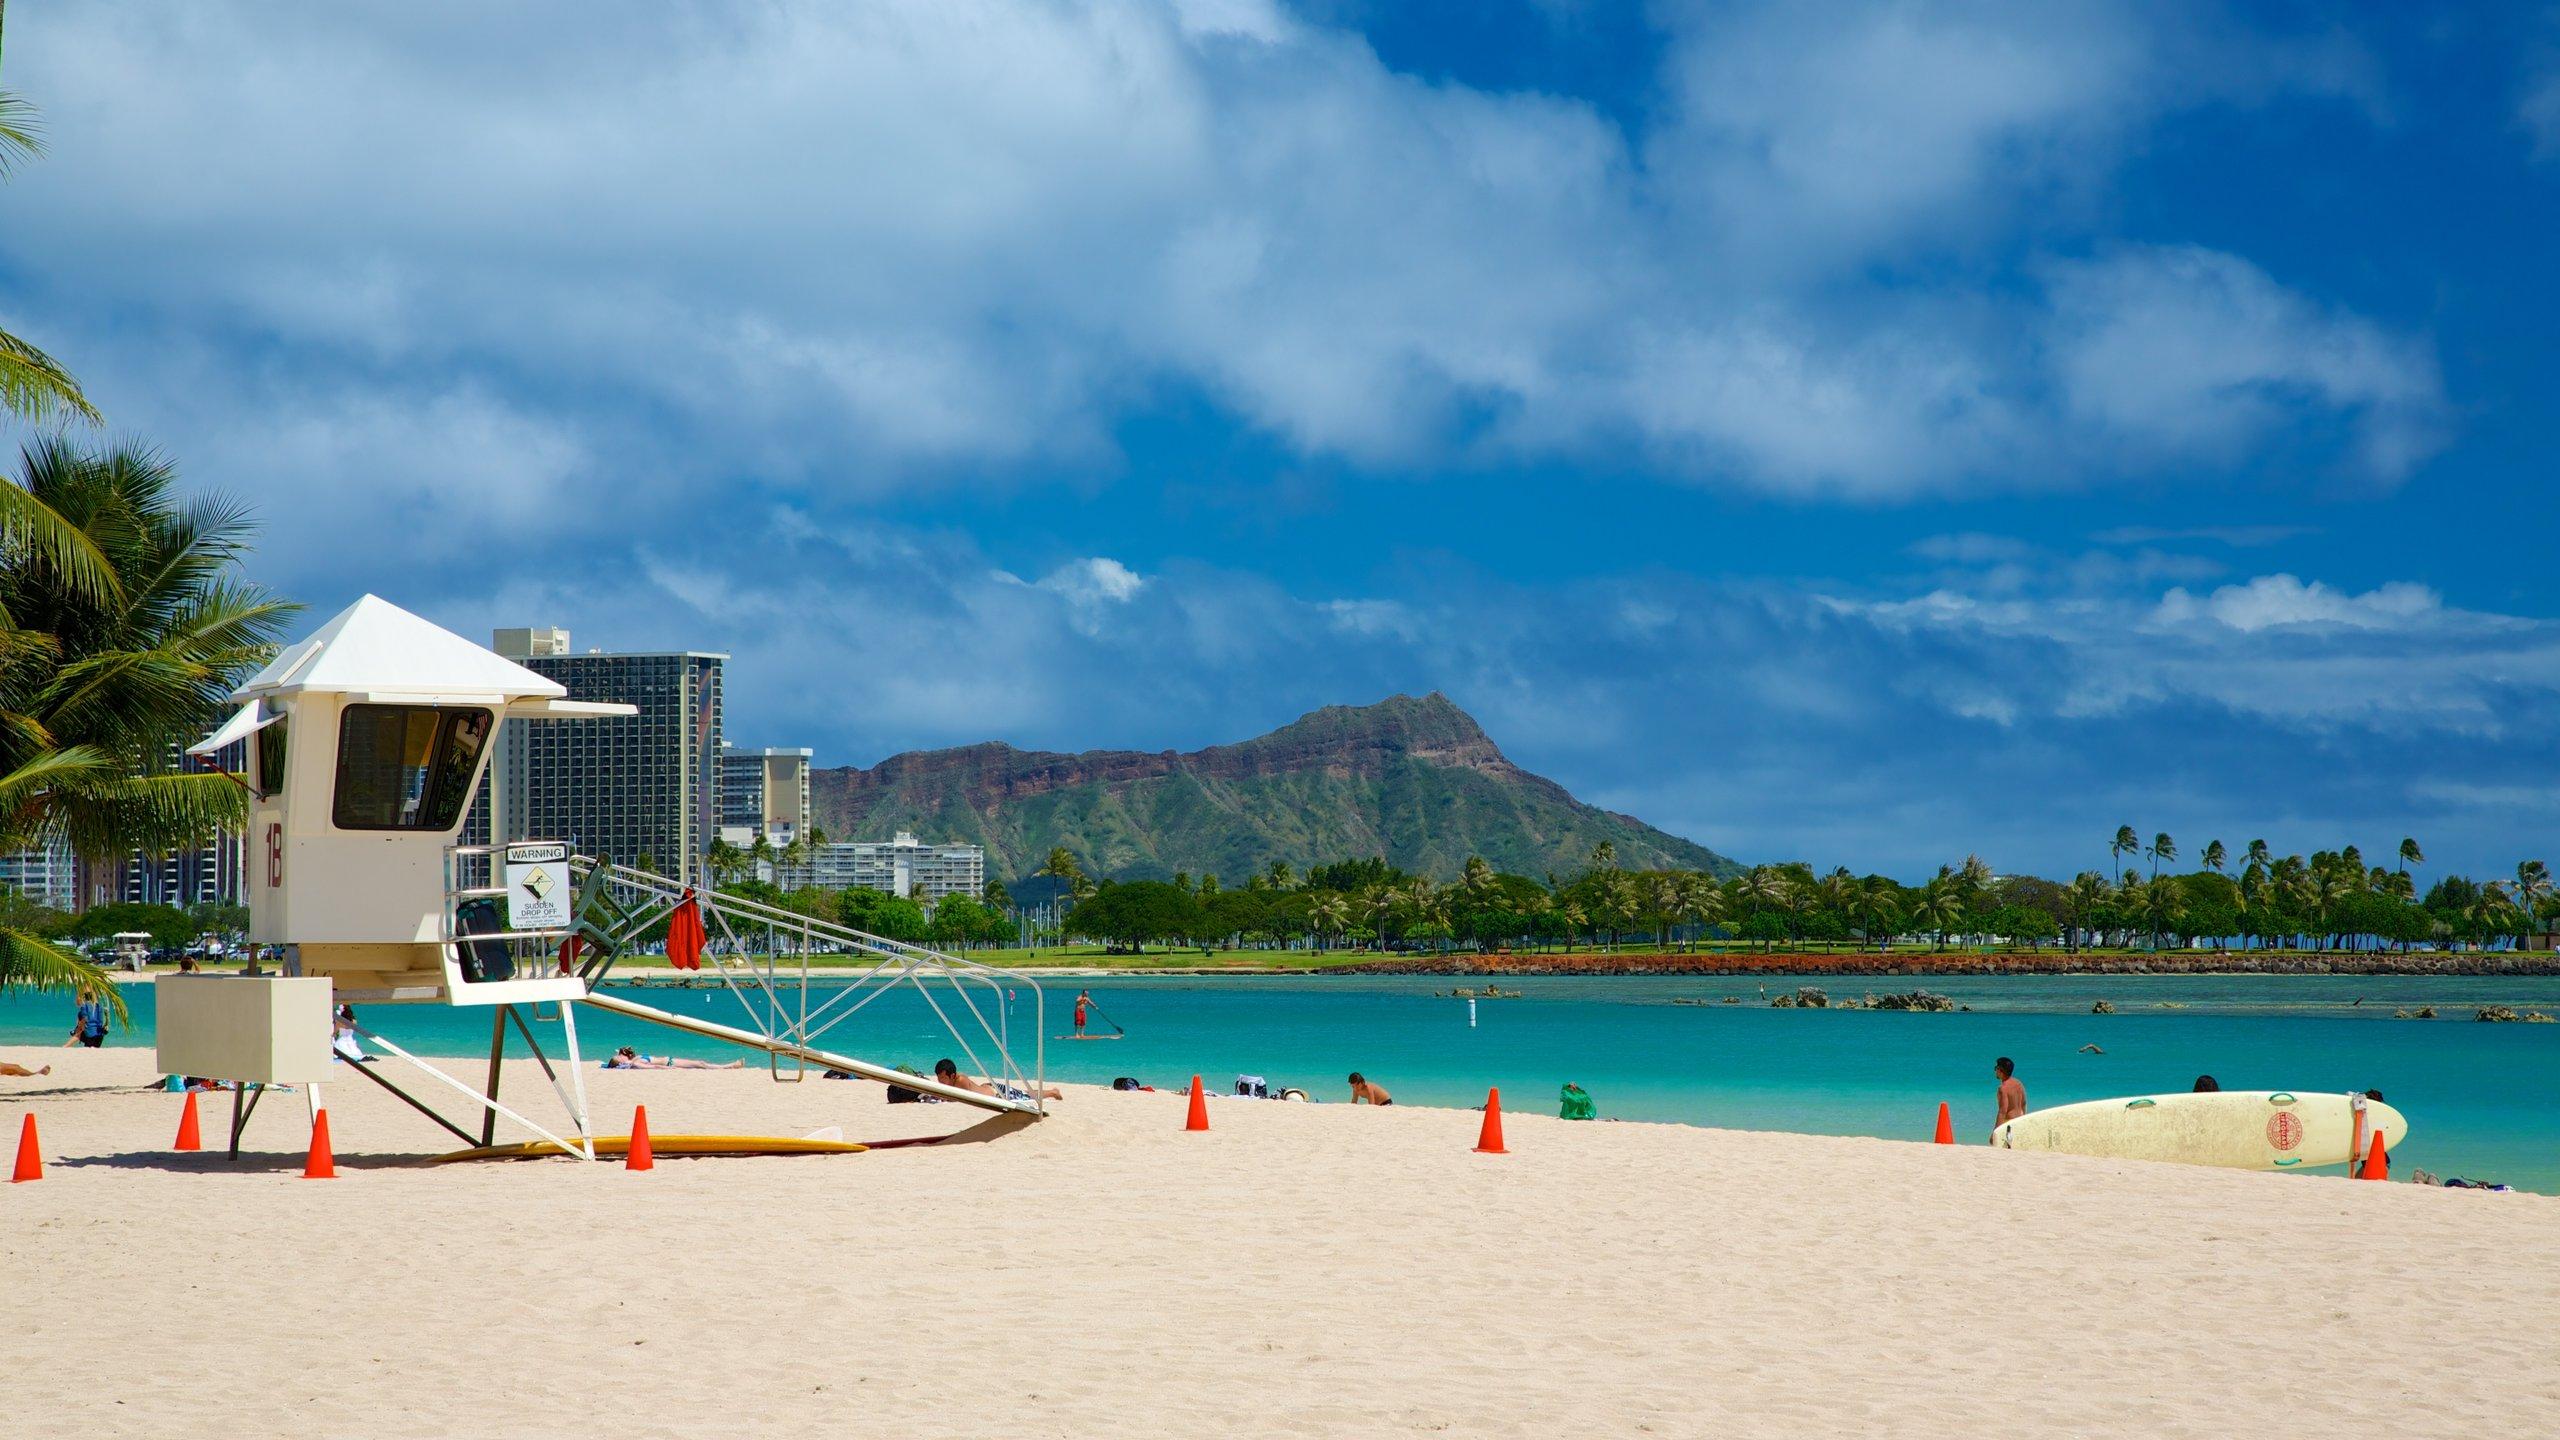 Ala Moana, Honolulu, Hawaii, United States of America